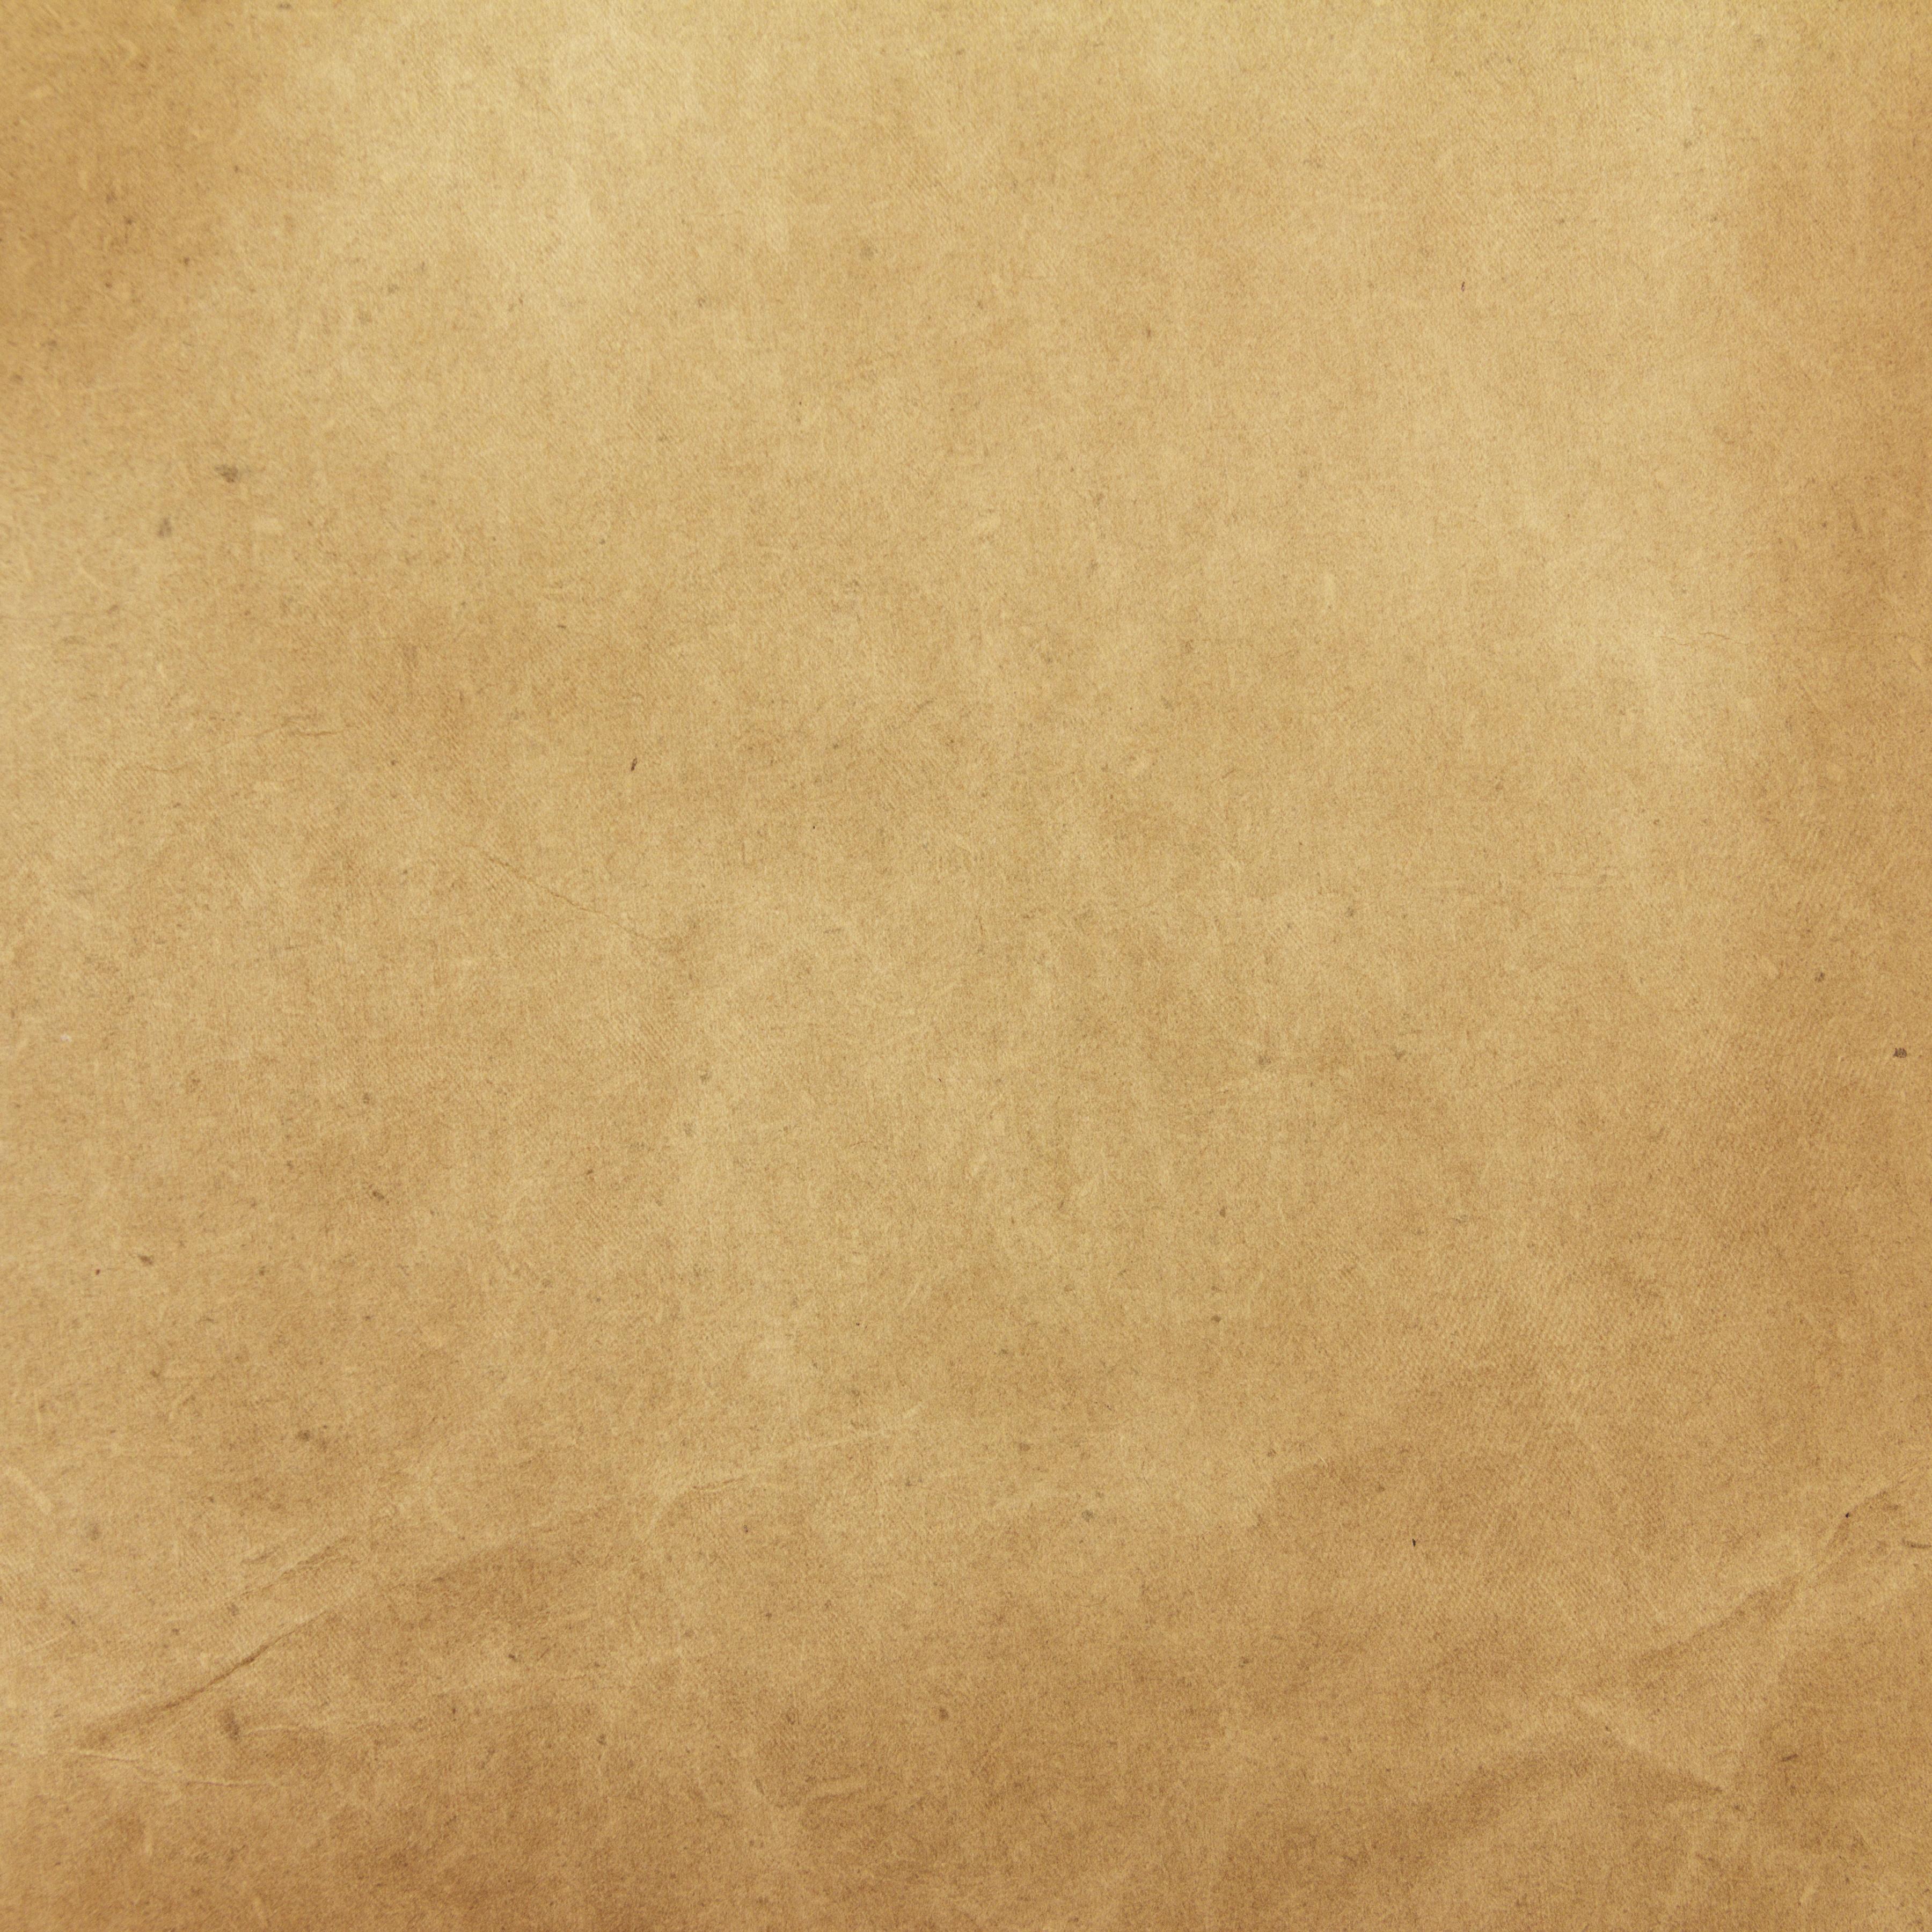 Free Photo Grunge Paper Texture